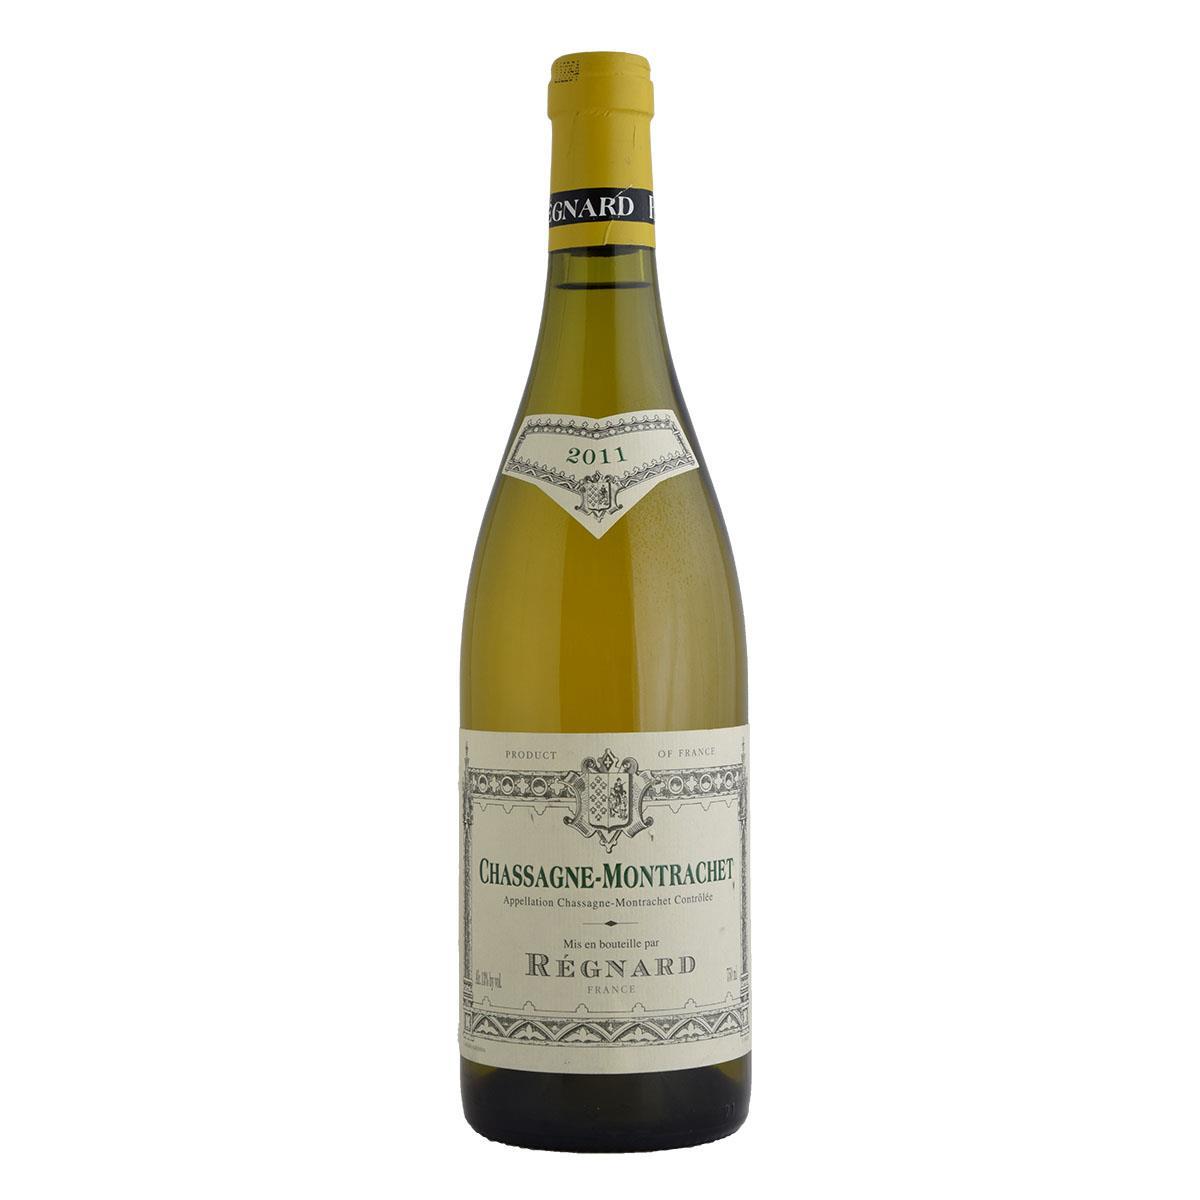 Regnard Chassagne Montrachet 2011 750ml Λευκό